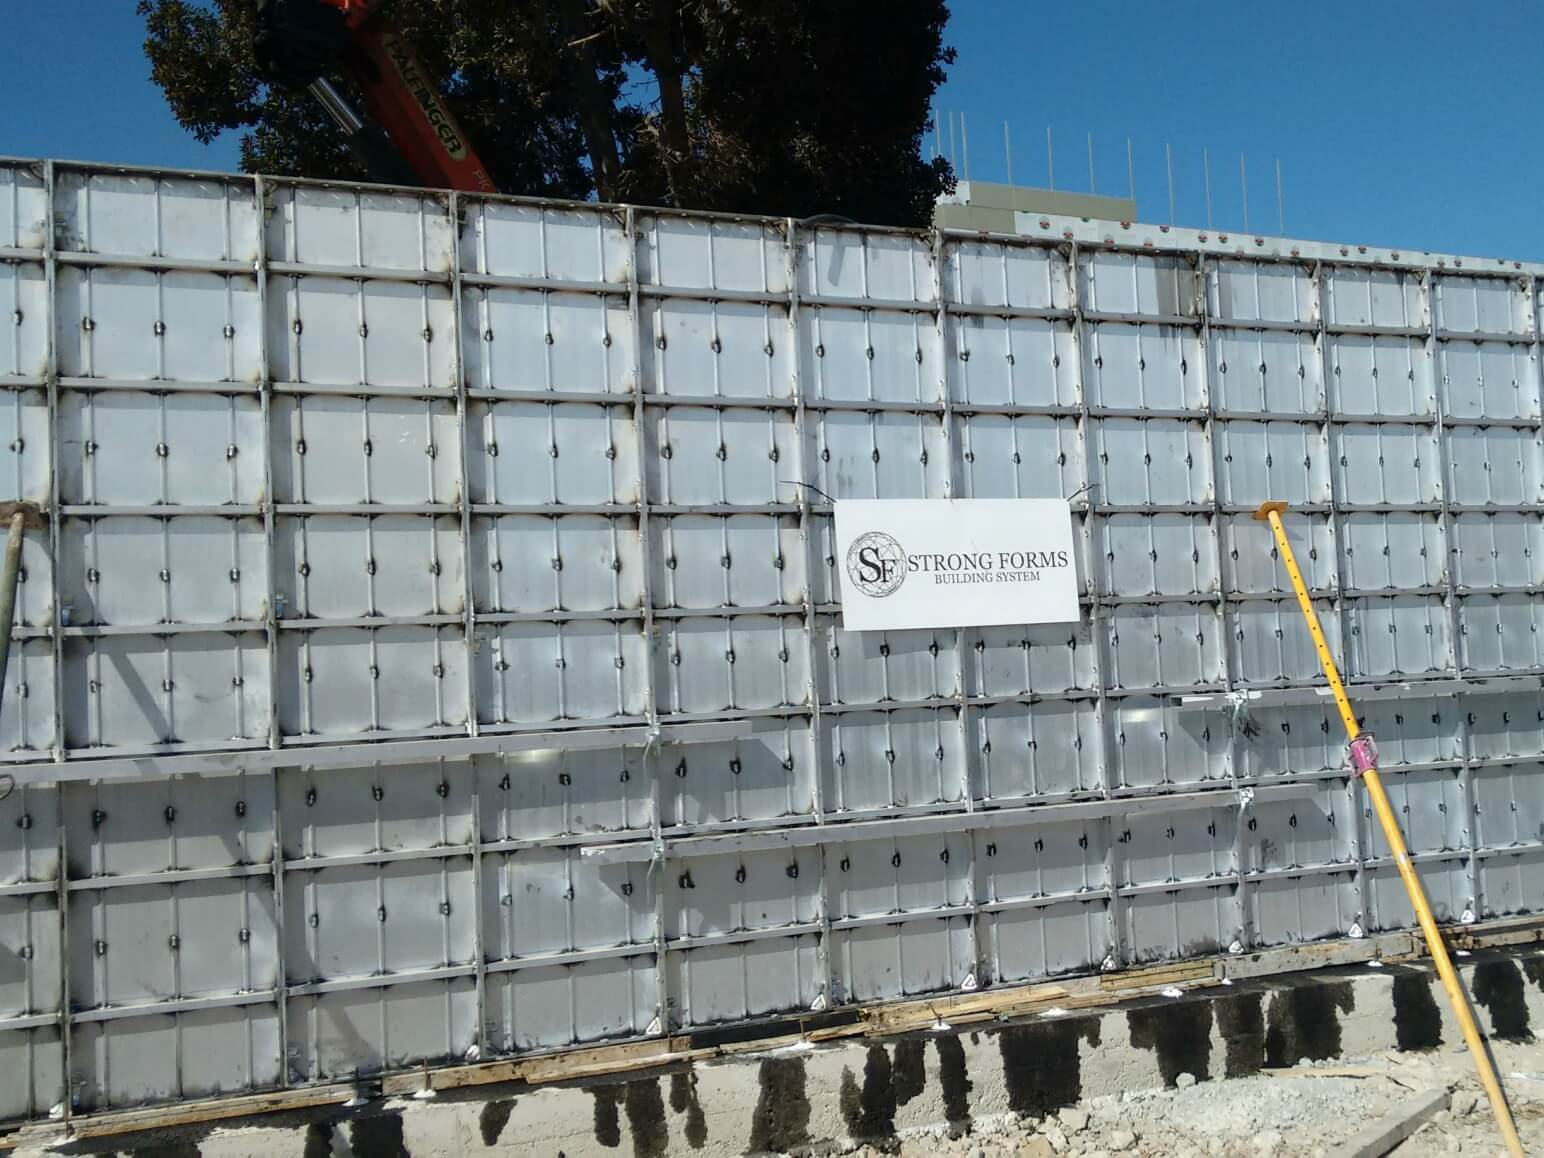 proyecto muro perimetral encofrados de aluminio construccion strong forms alicante 9